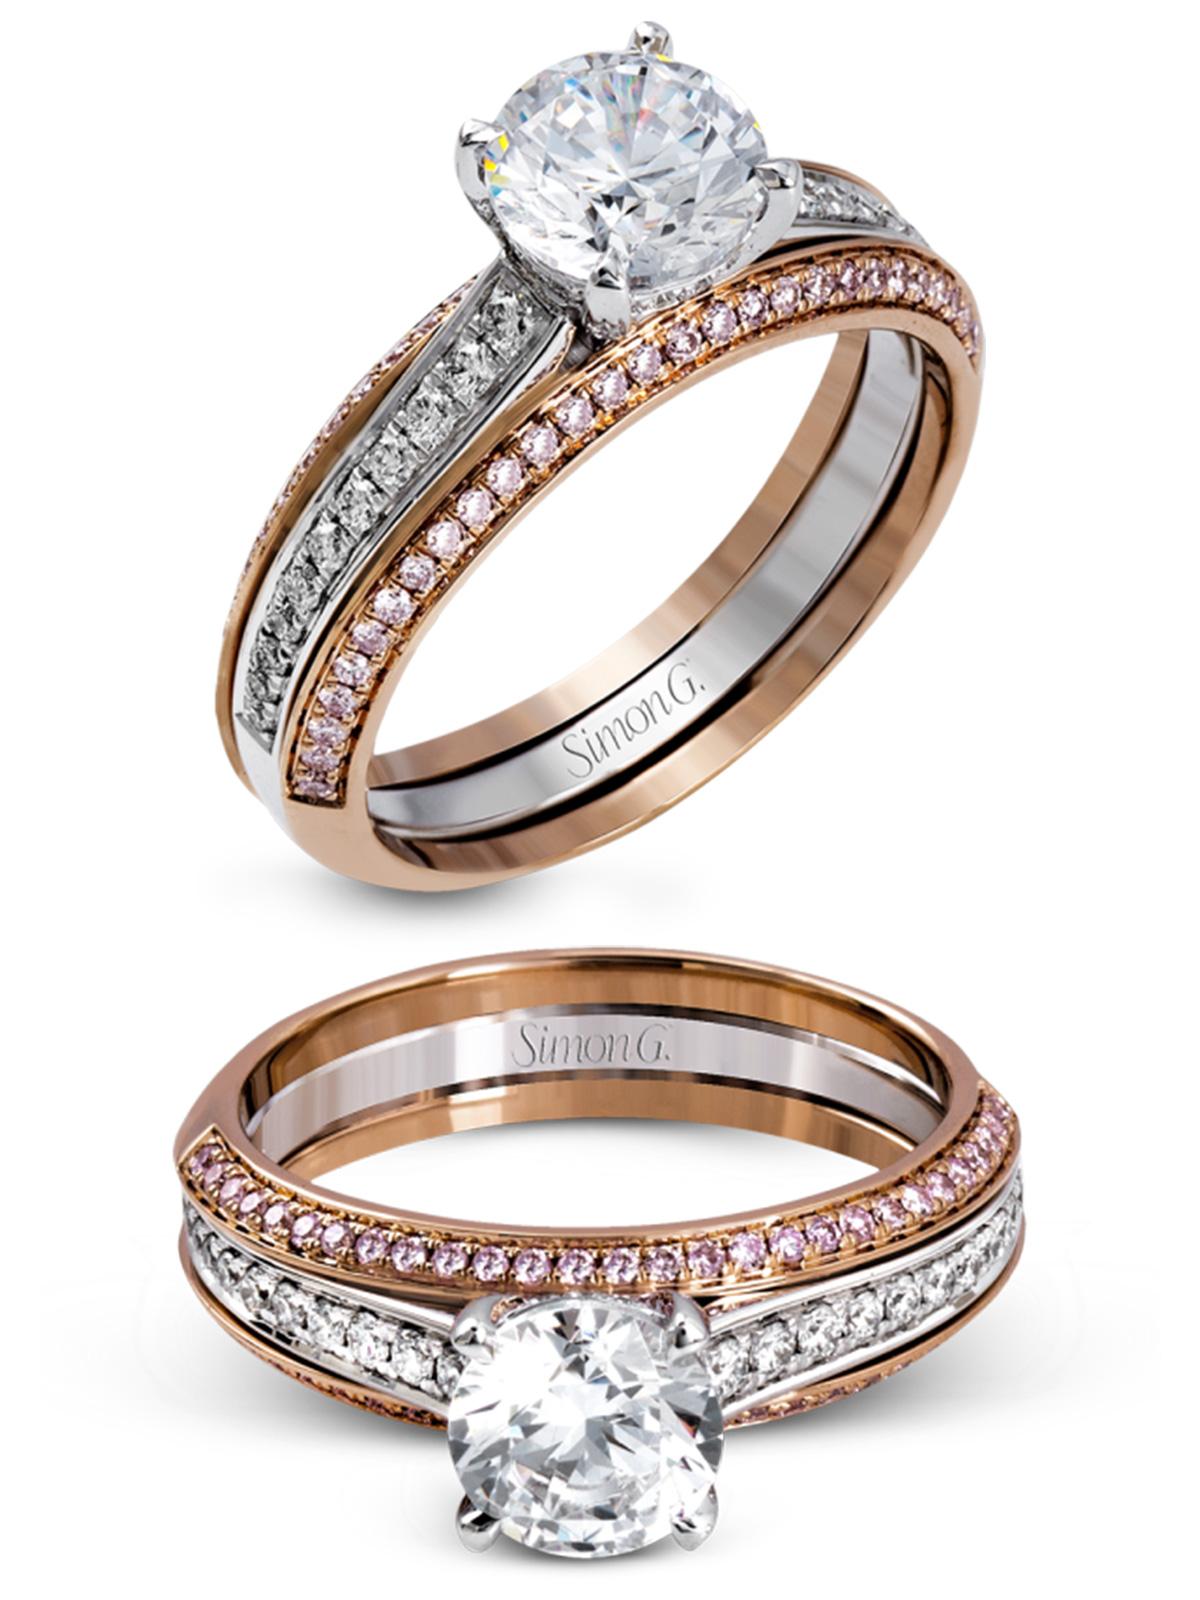 simon g jewelry 2017 wedding trends diamond engagement ring MR2713  white gold rose gold pink diamonds e ring